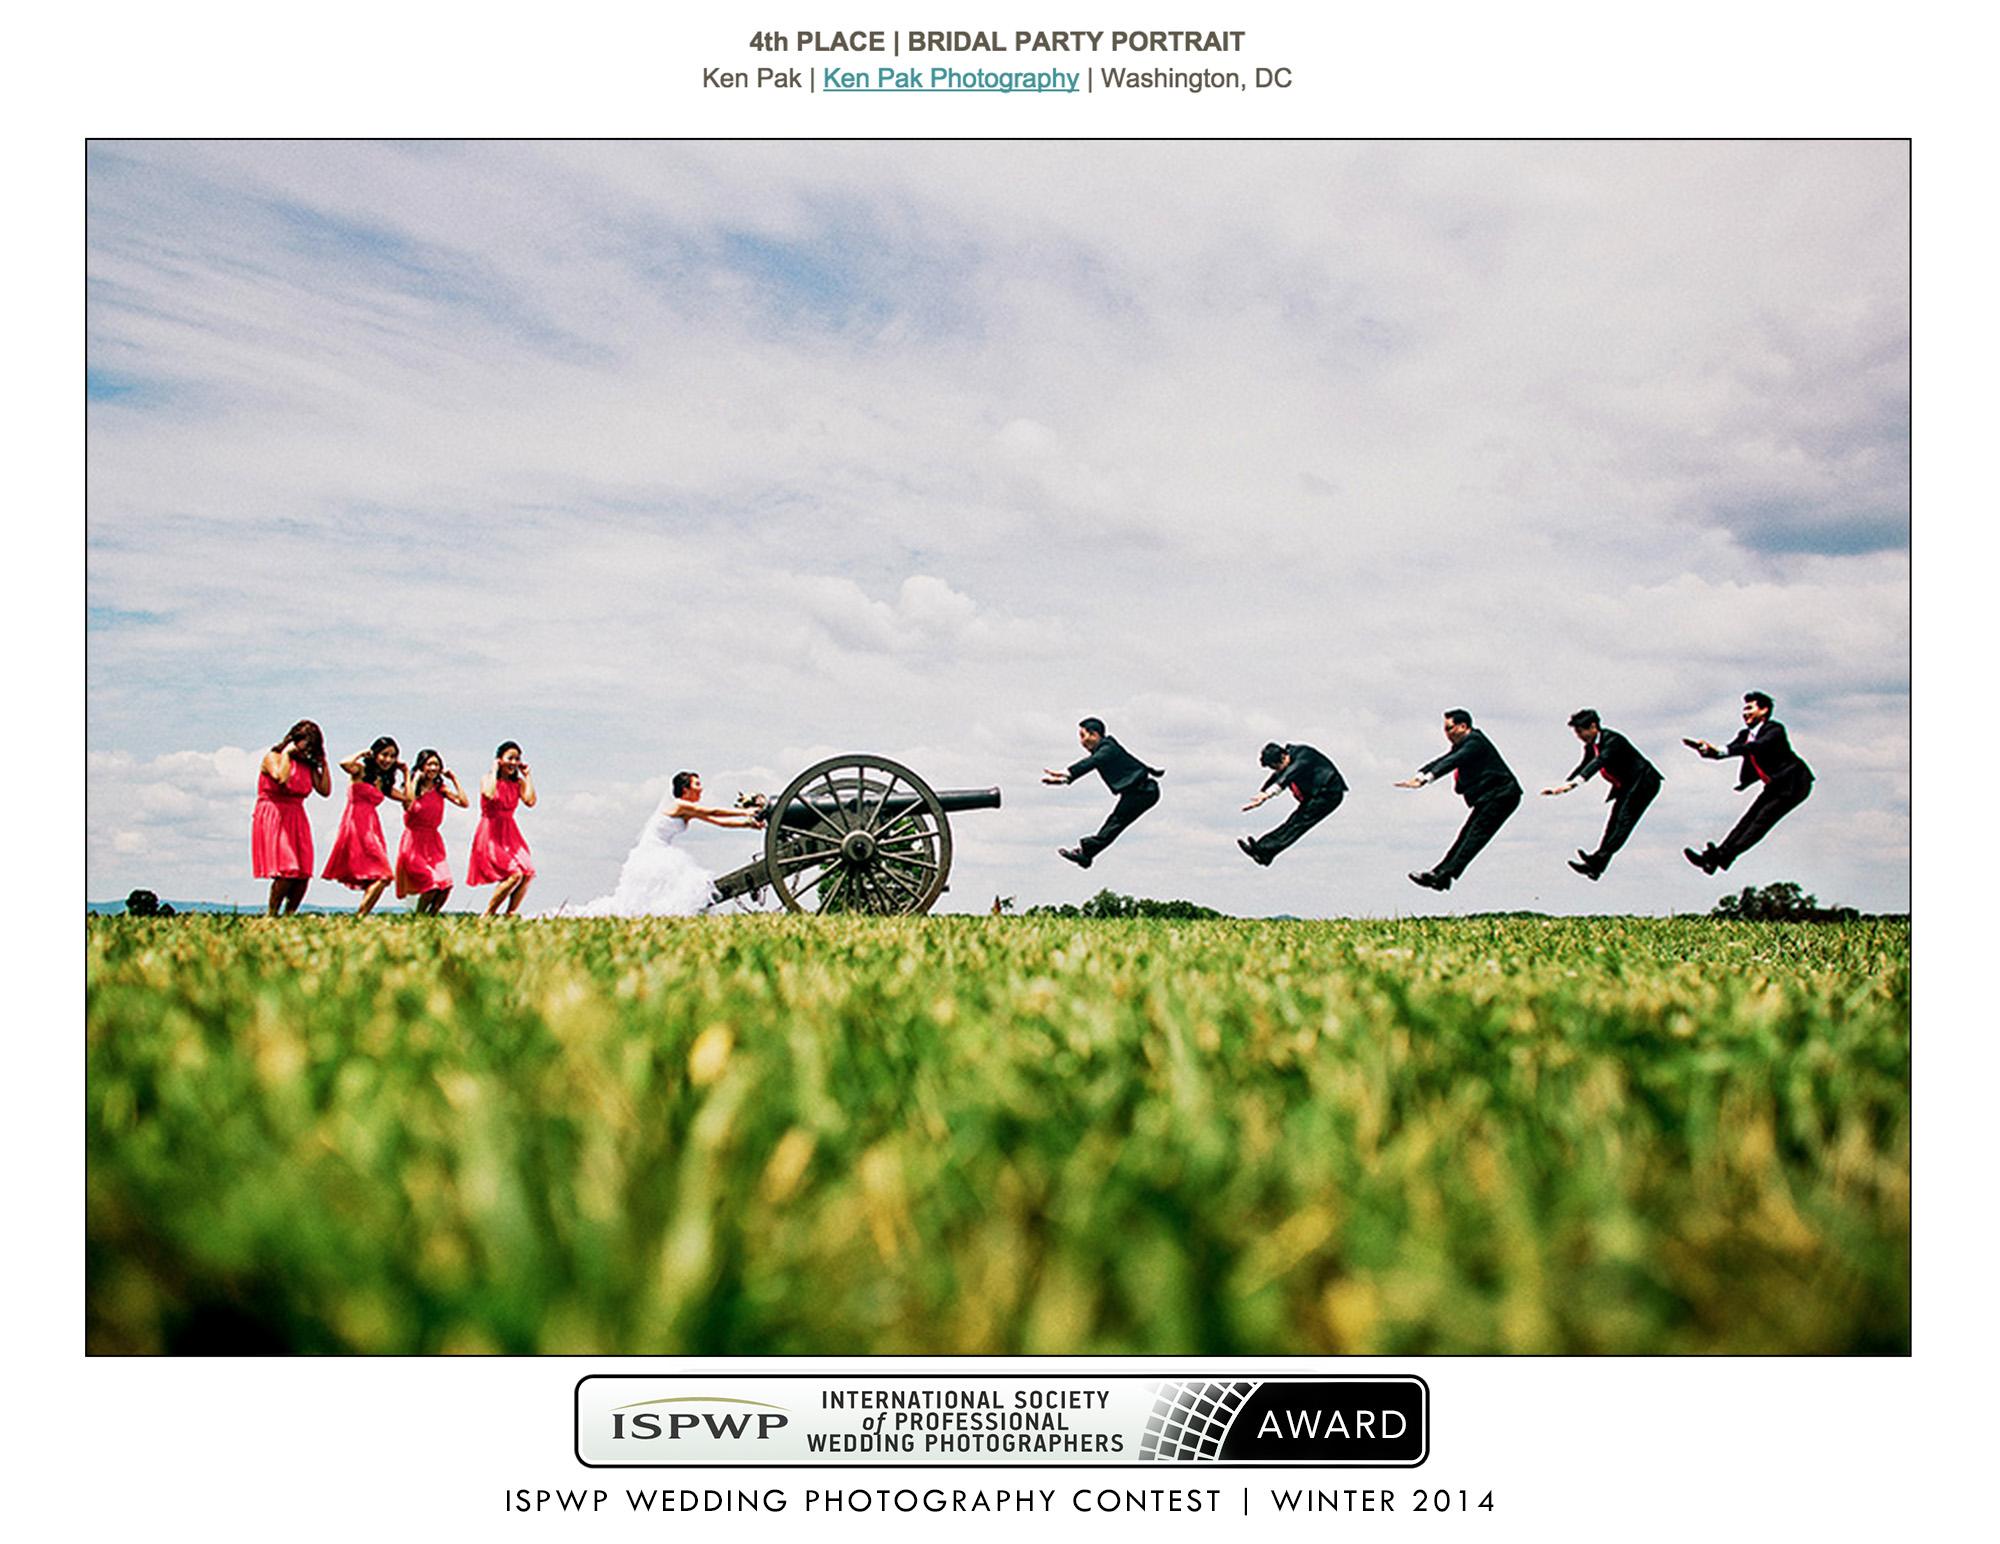 ISPWP 2014 WINTER BRIDAL PARTY 4.jpg